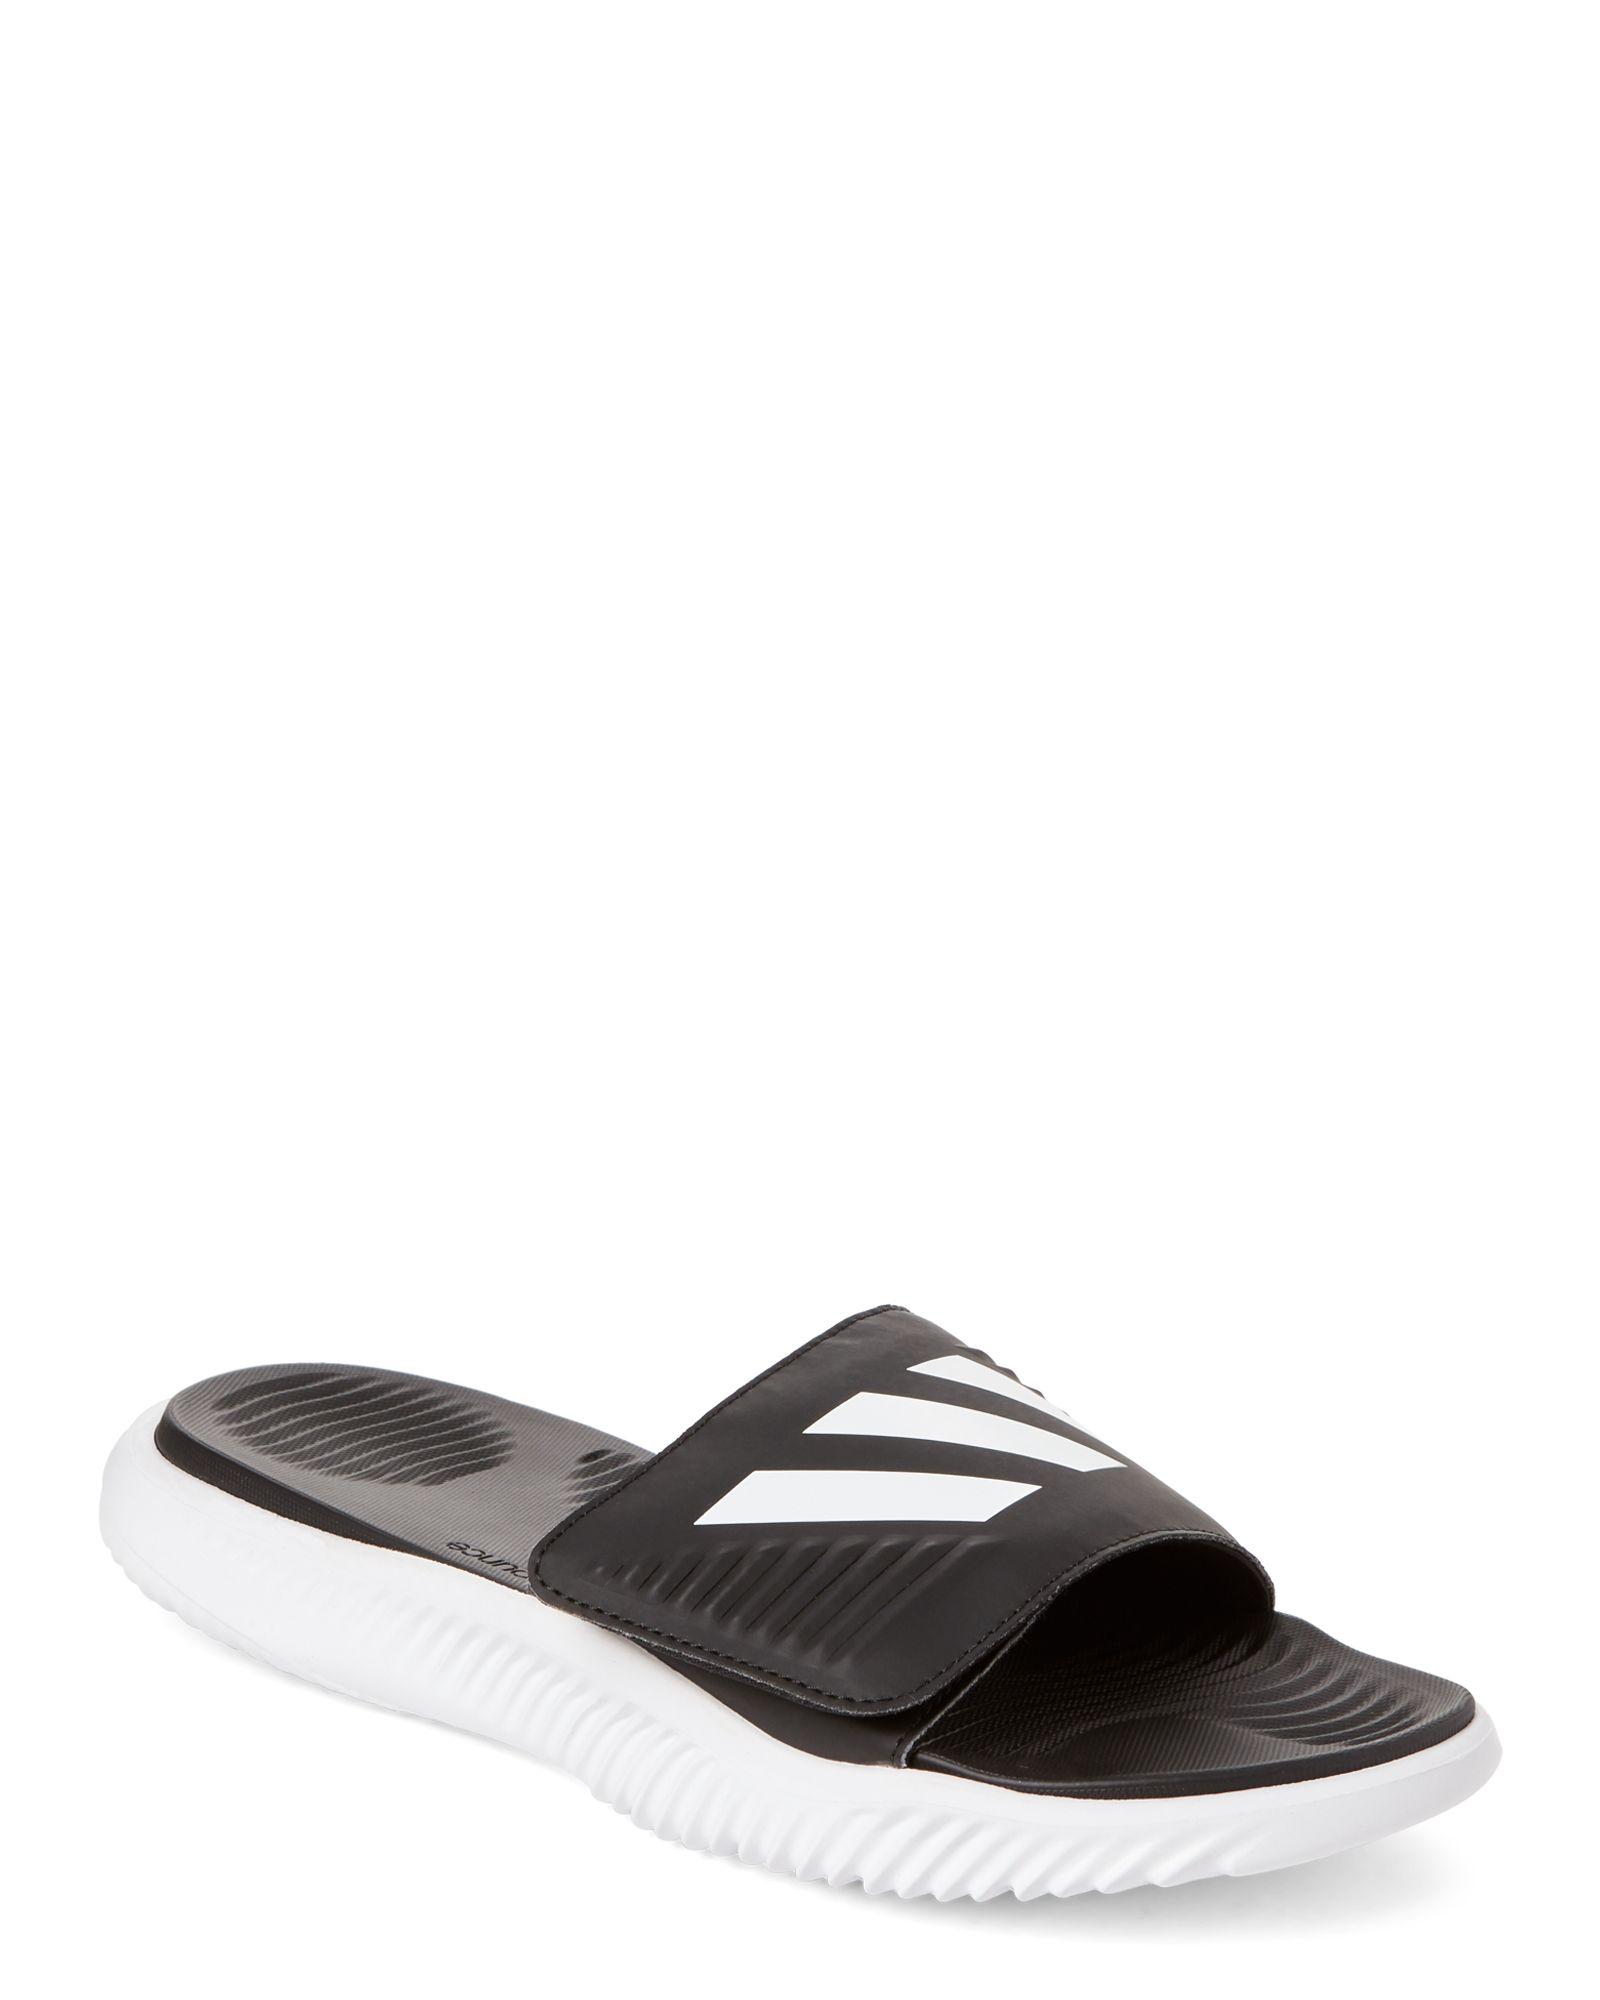 e7db89c4127 Adidas White   Black Alpha Bounce Slide Sandals